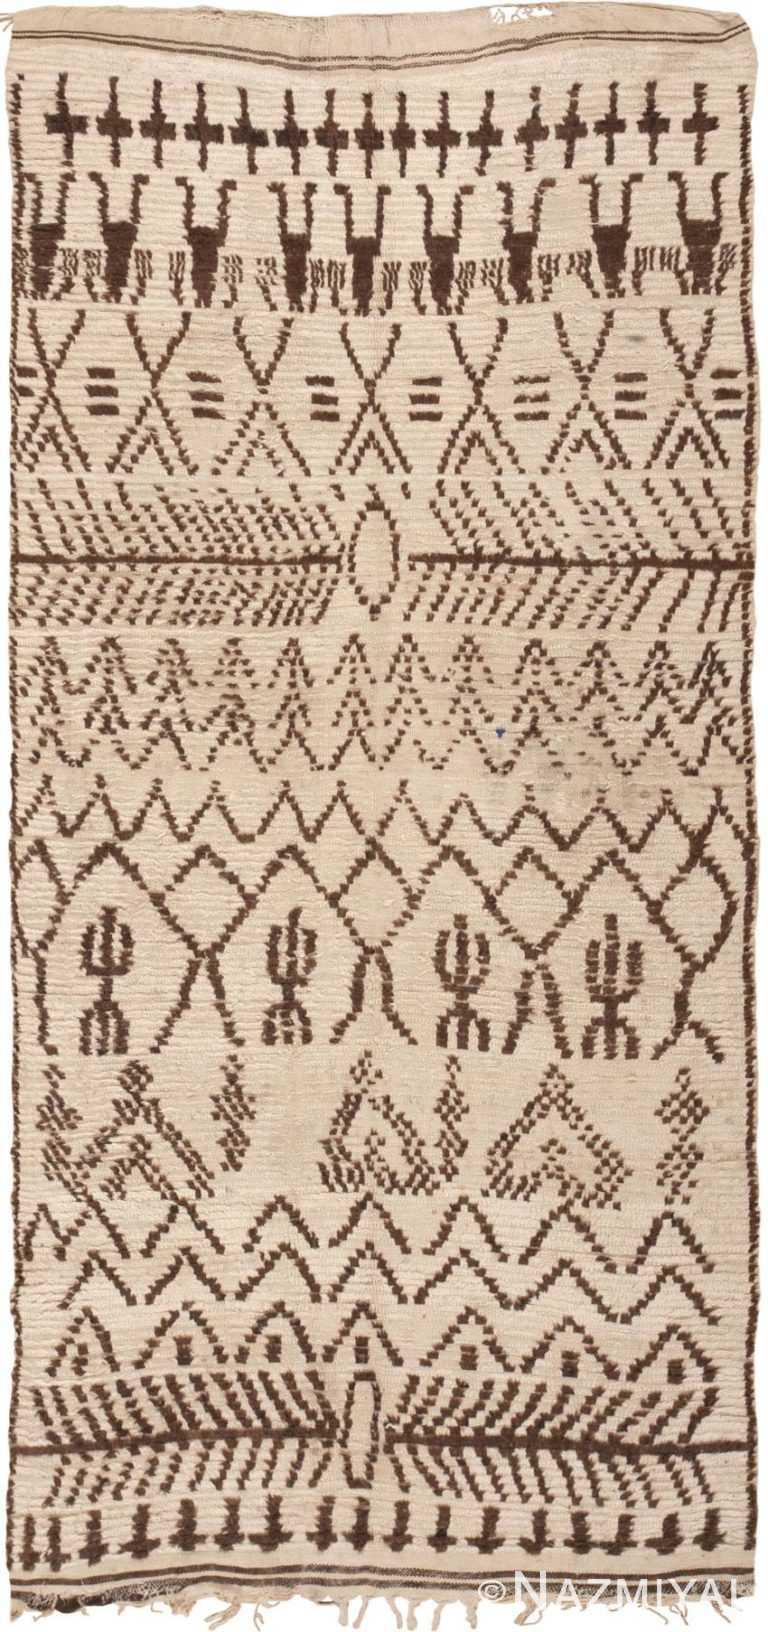 Vintage Moroccan Rug 46042 Detail/Large View